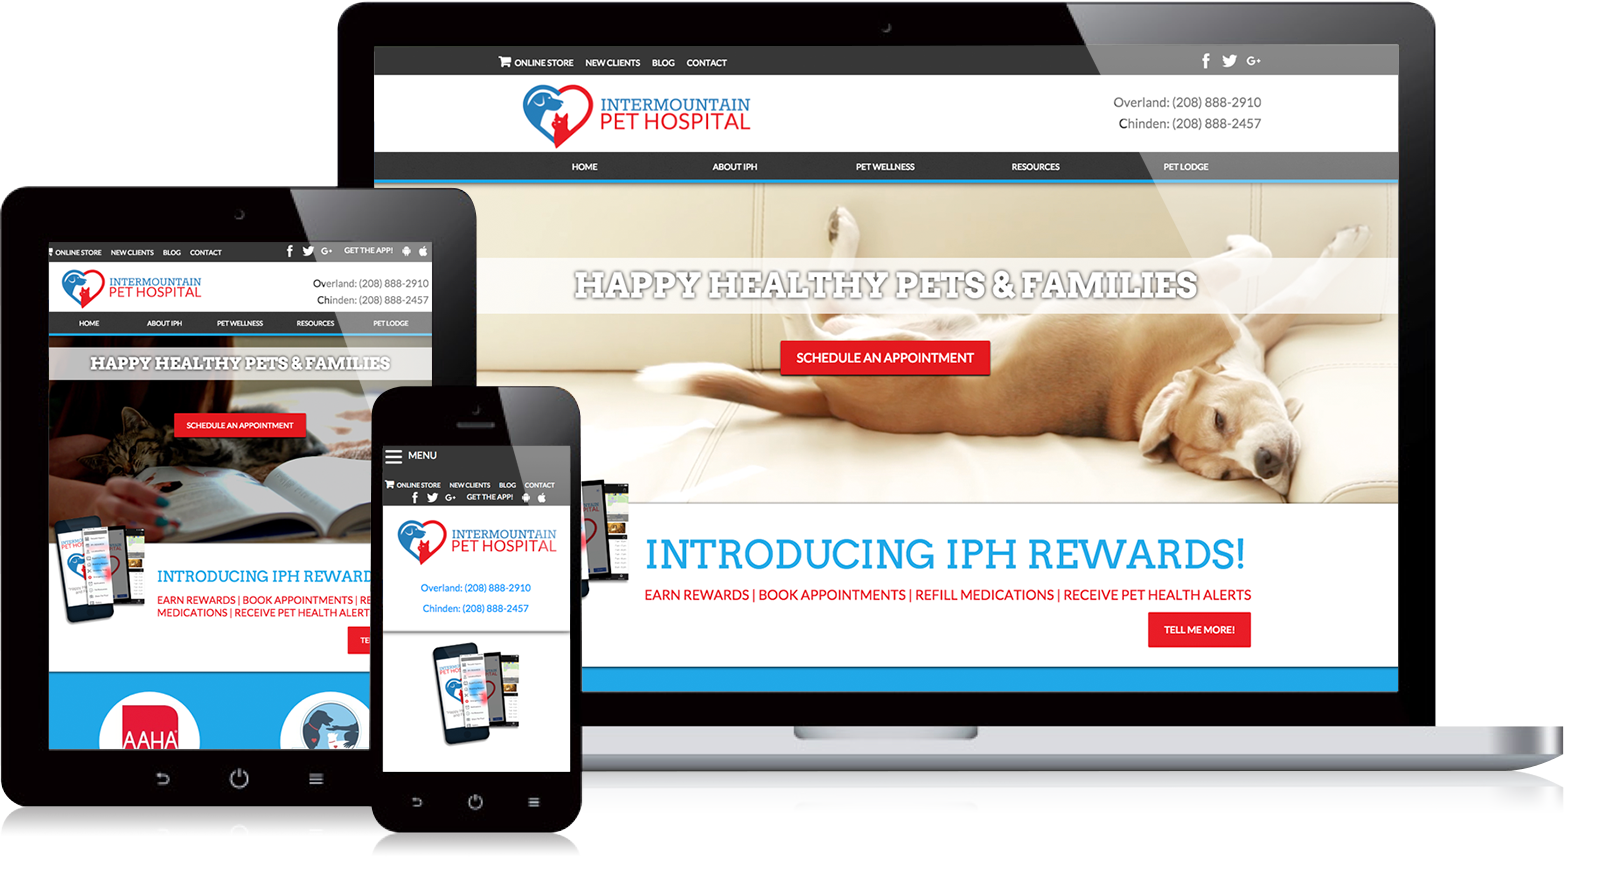 Intermountain Pet Hospital Website